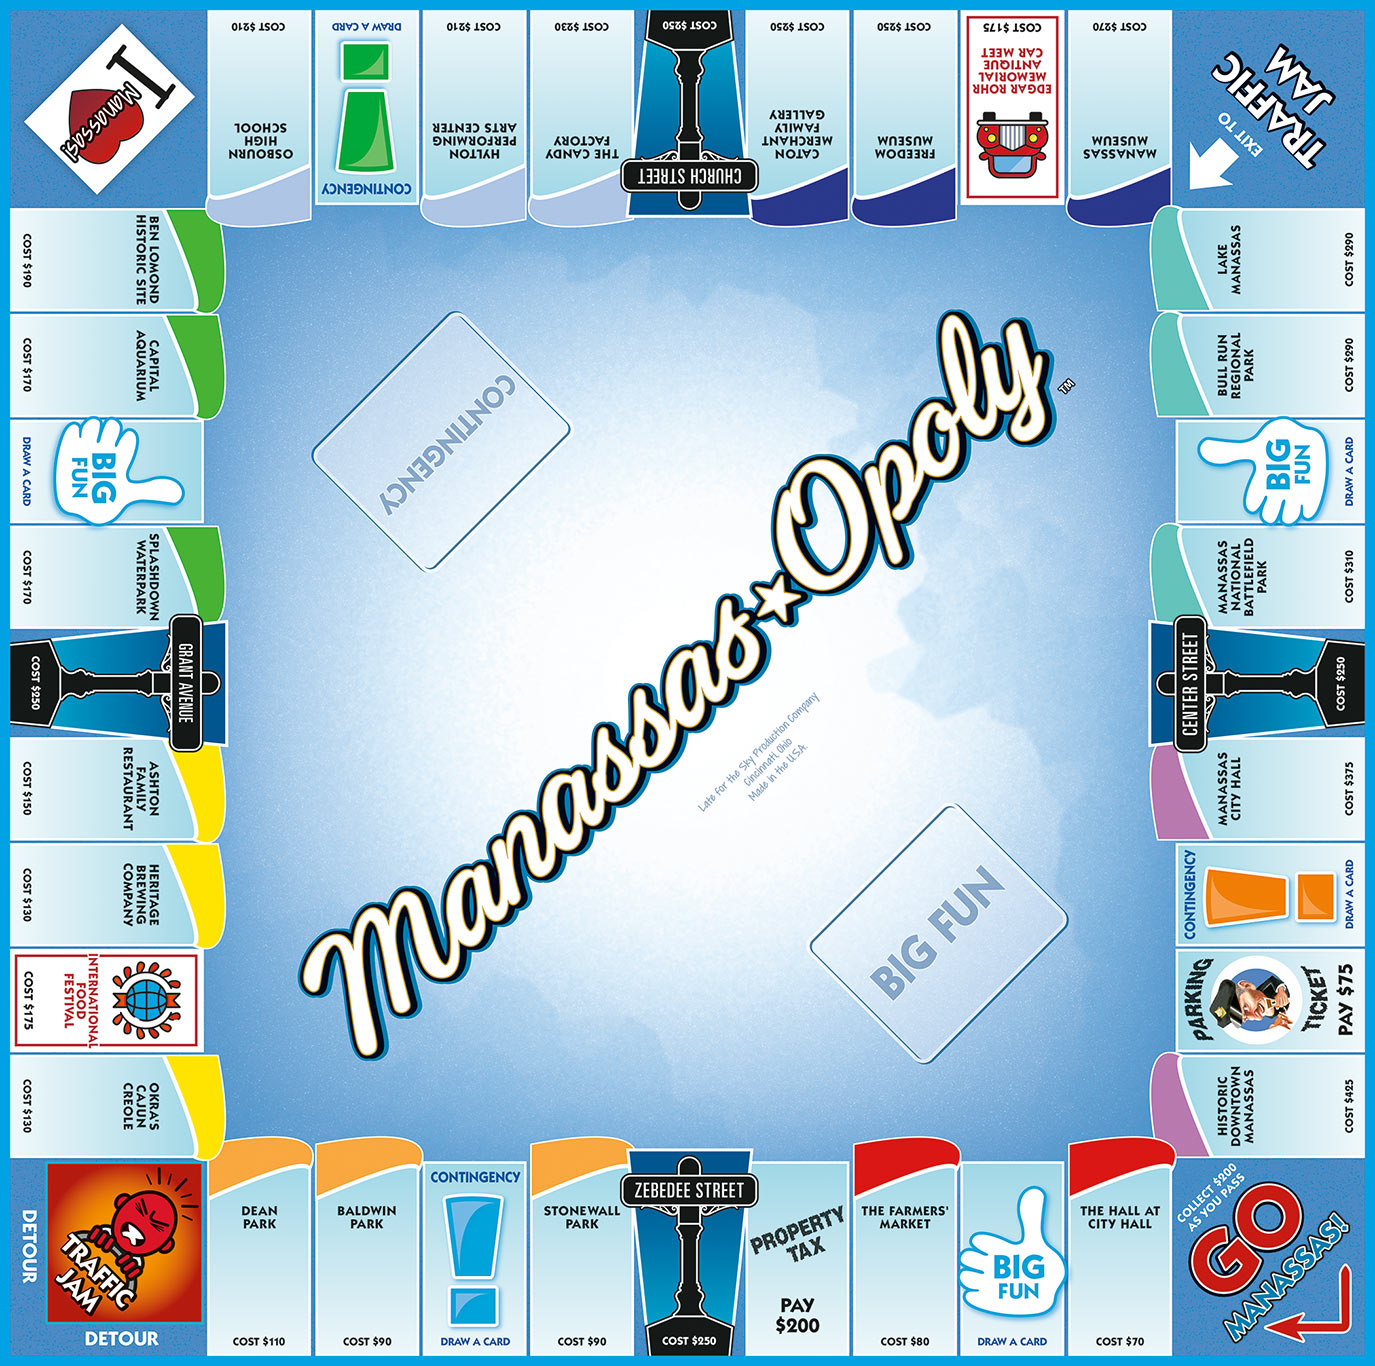 MANASSAS-OPOLY Board Game